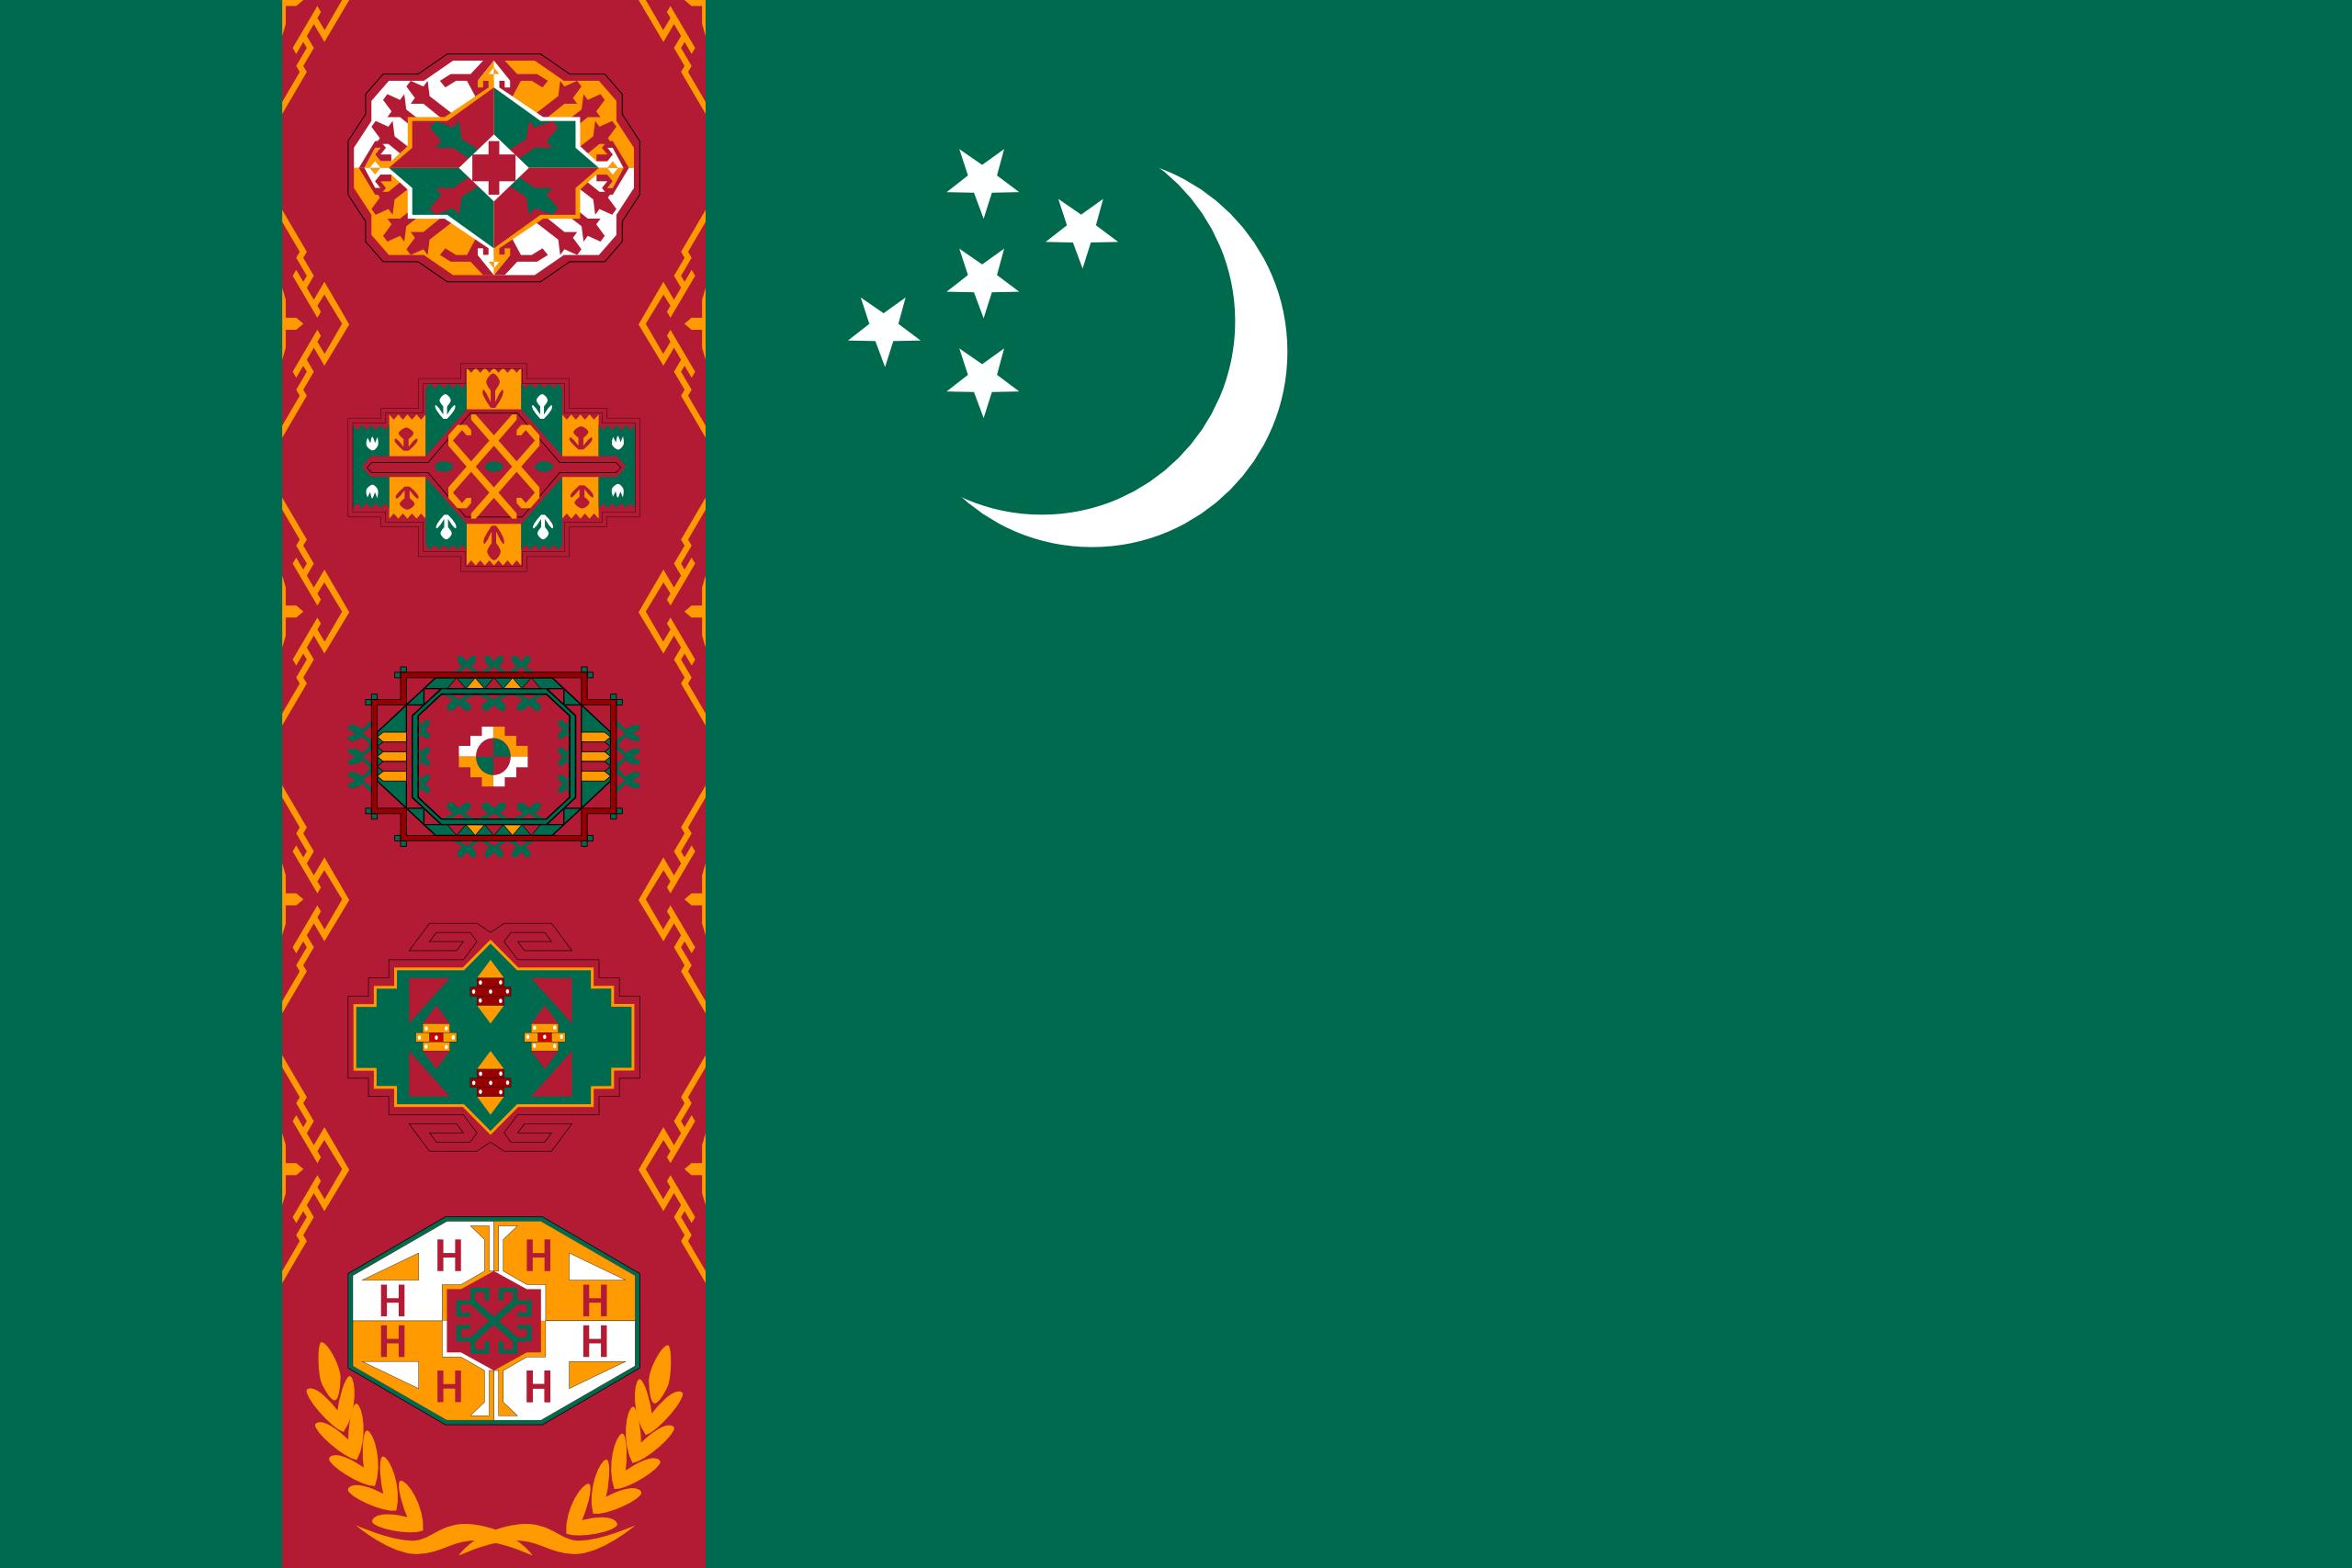 turkmenistán, país, emblema, insignia, símbolo - Fondos de Pantalla HD - professor-falken.com